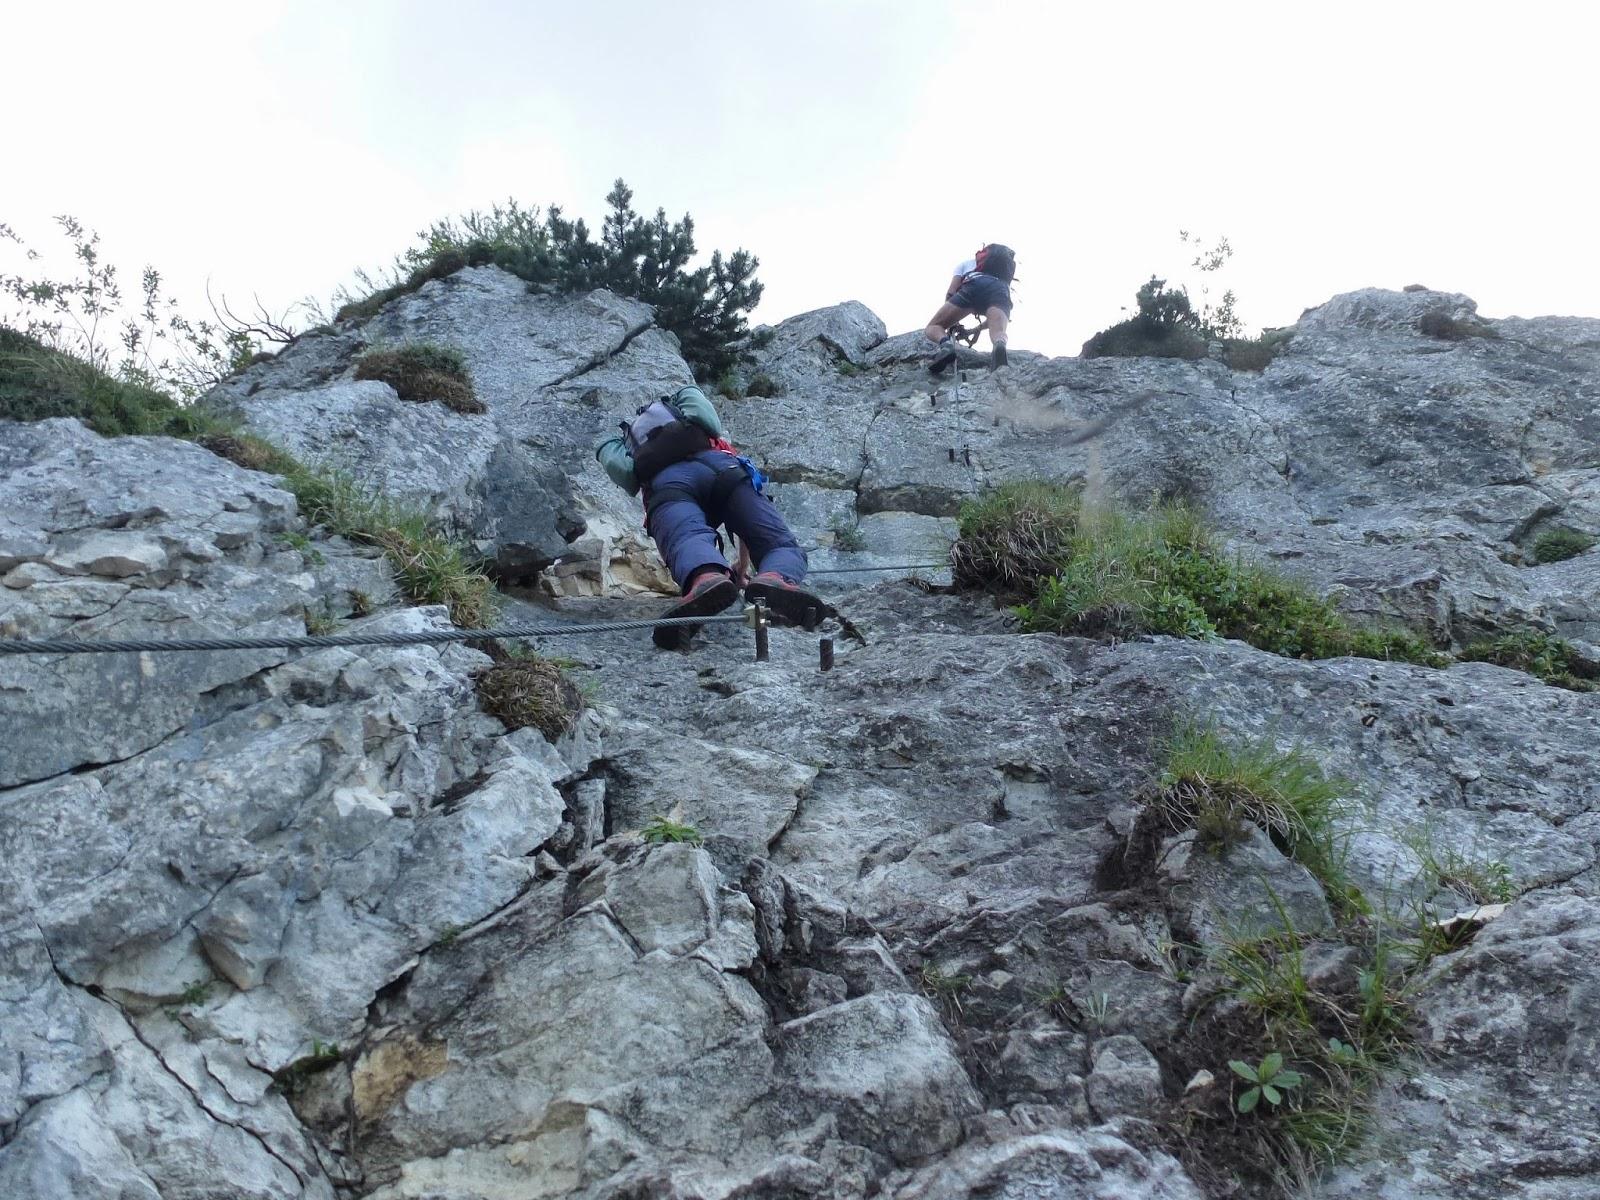 Klettersteig Mahdlgupf : Klettersteig mahdlgupf attersee